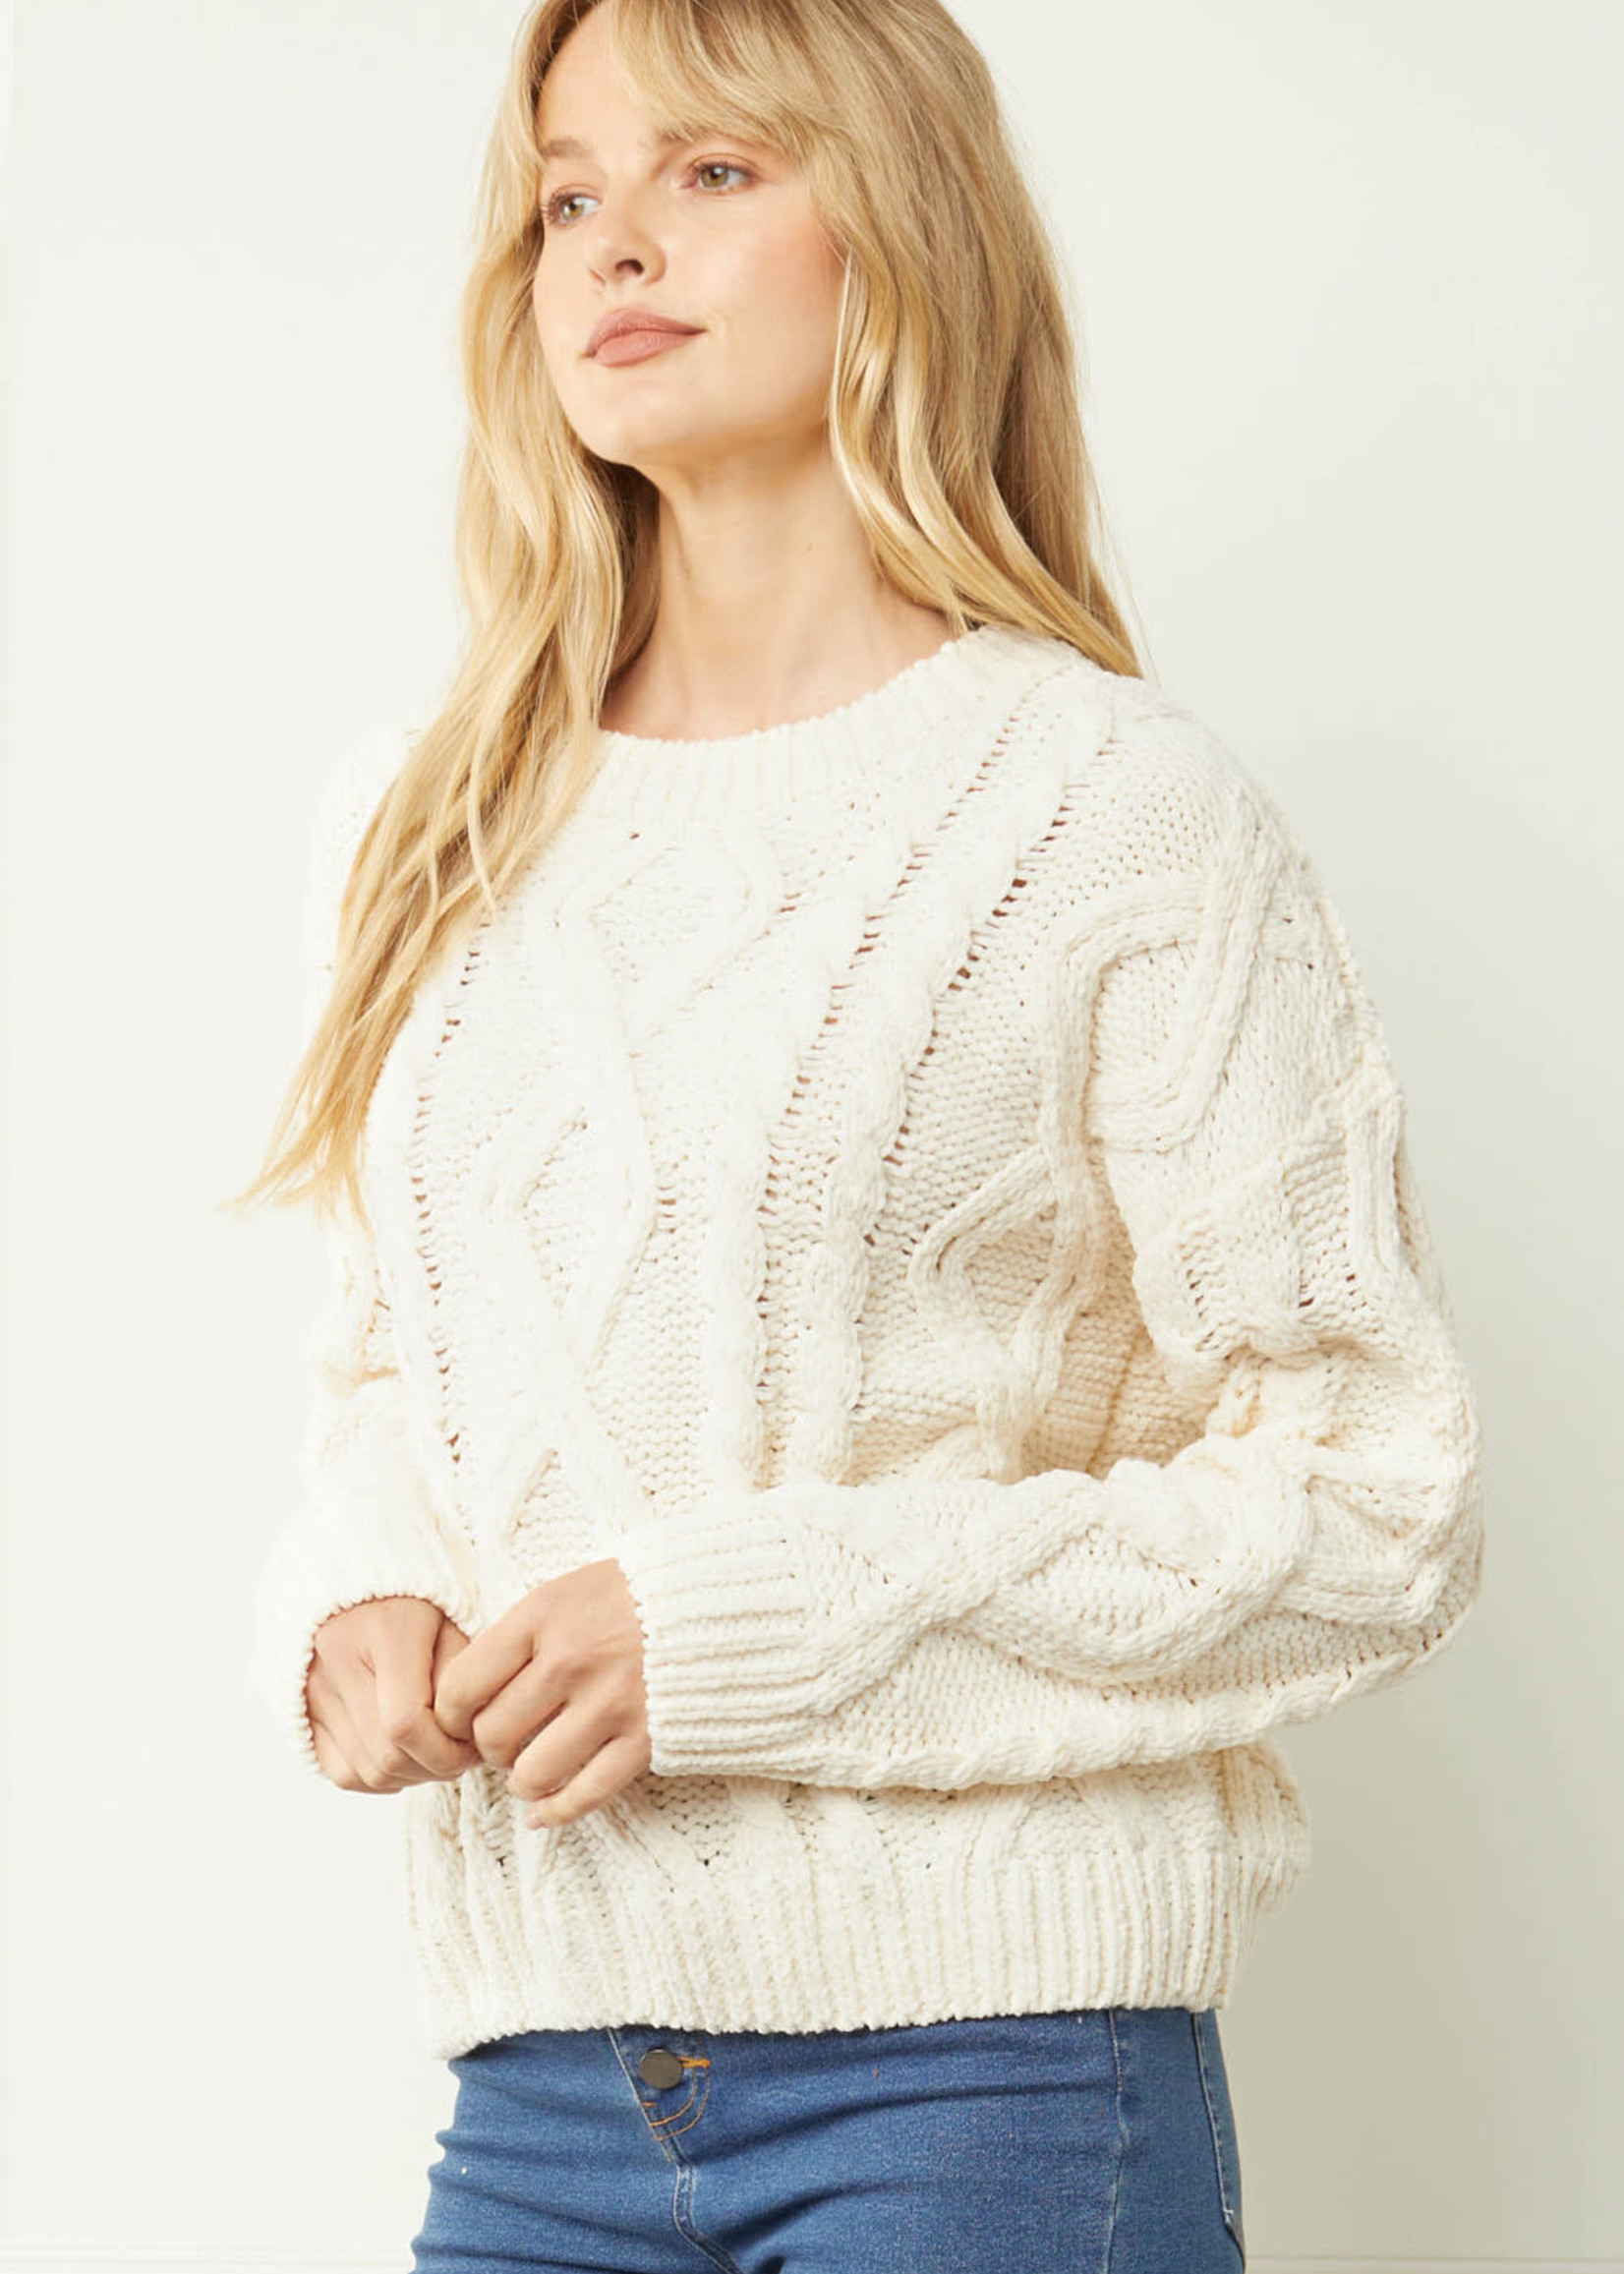 Cream Dream Sweater